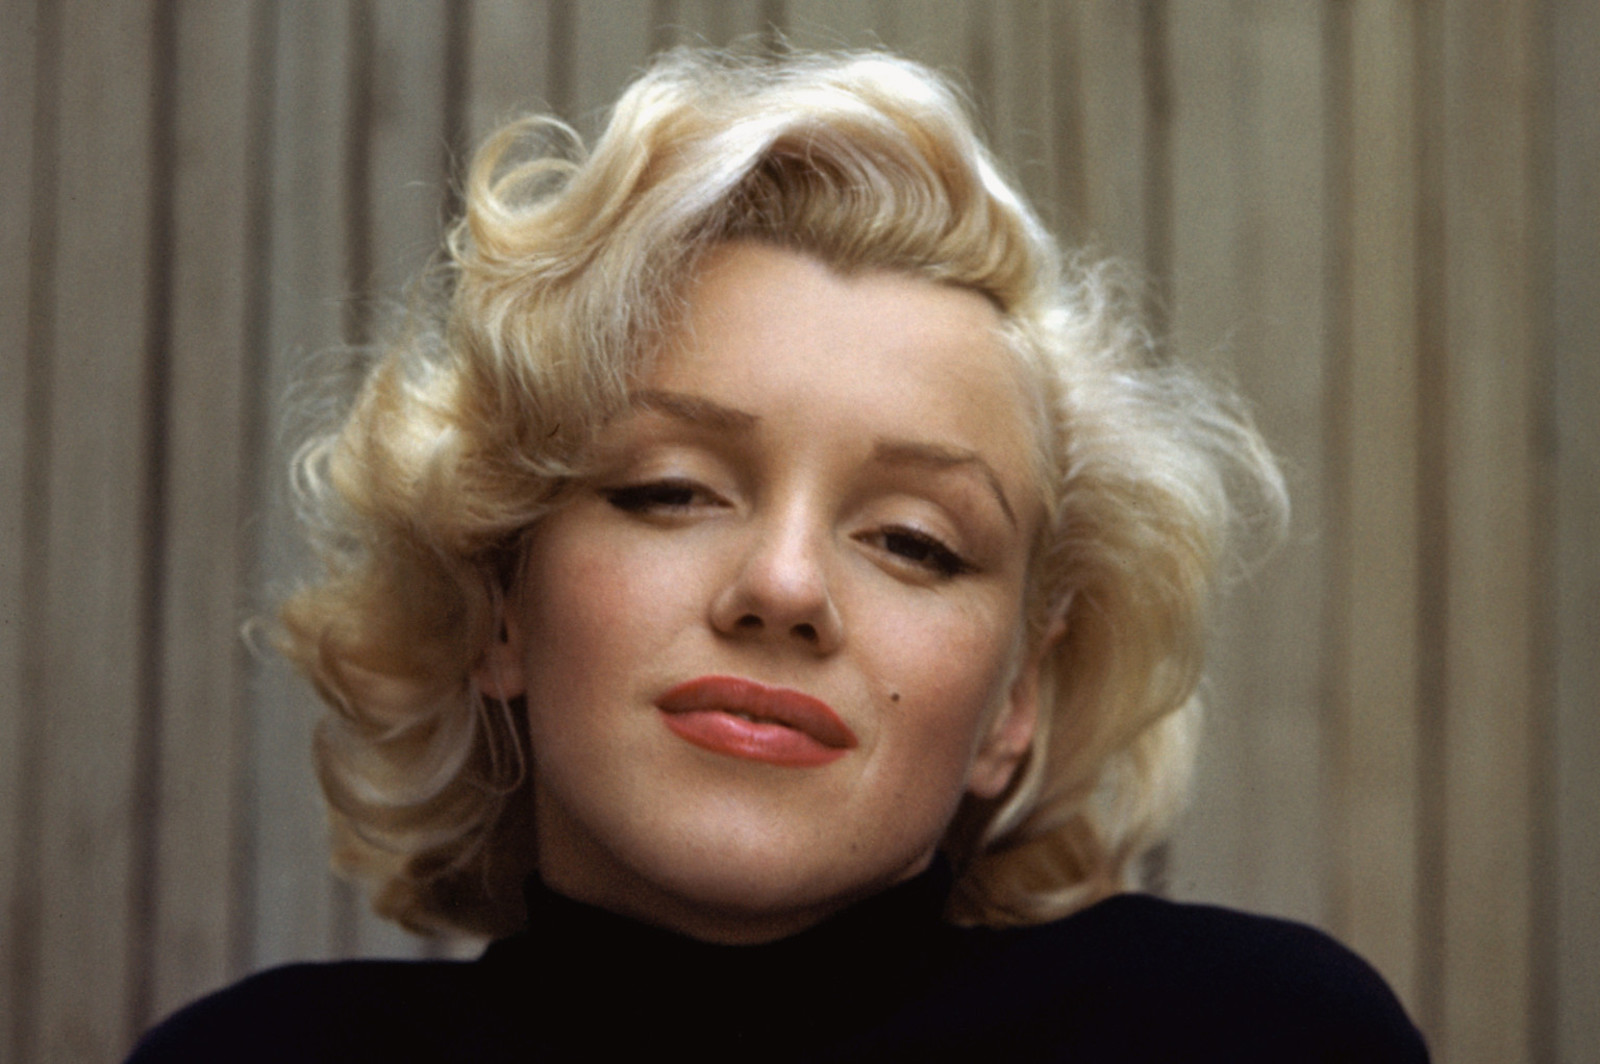 marilyn-monroe-headshot-Nude-Photos-of-Marilyn-Monroe-Go-Up-for-Auction-main-image.jpg